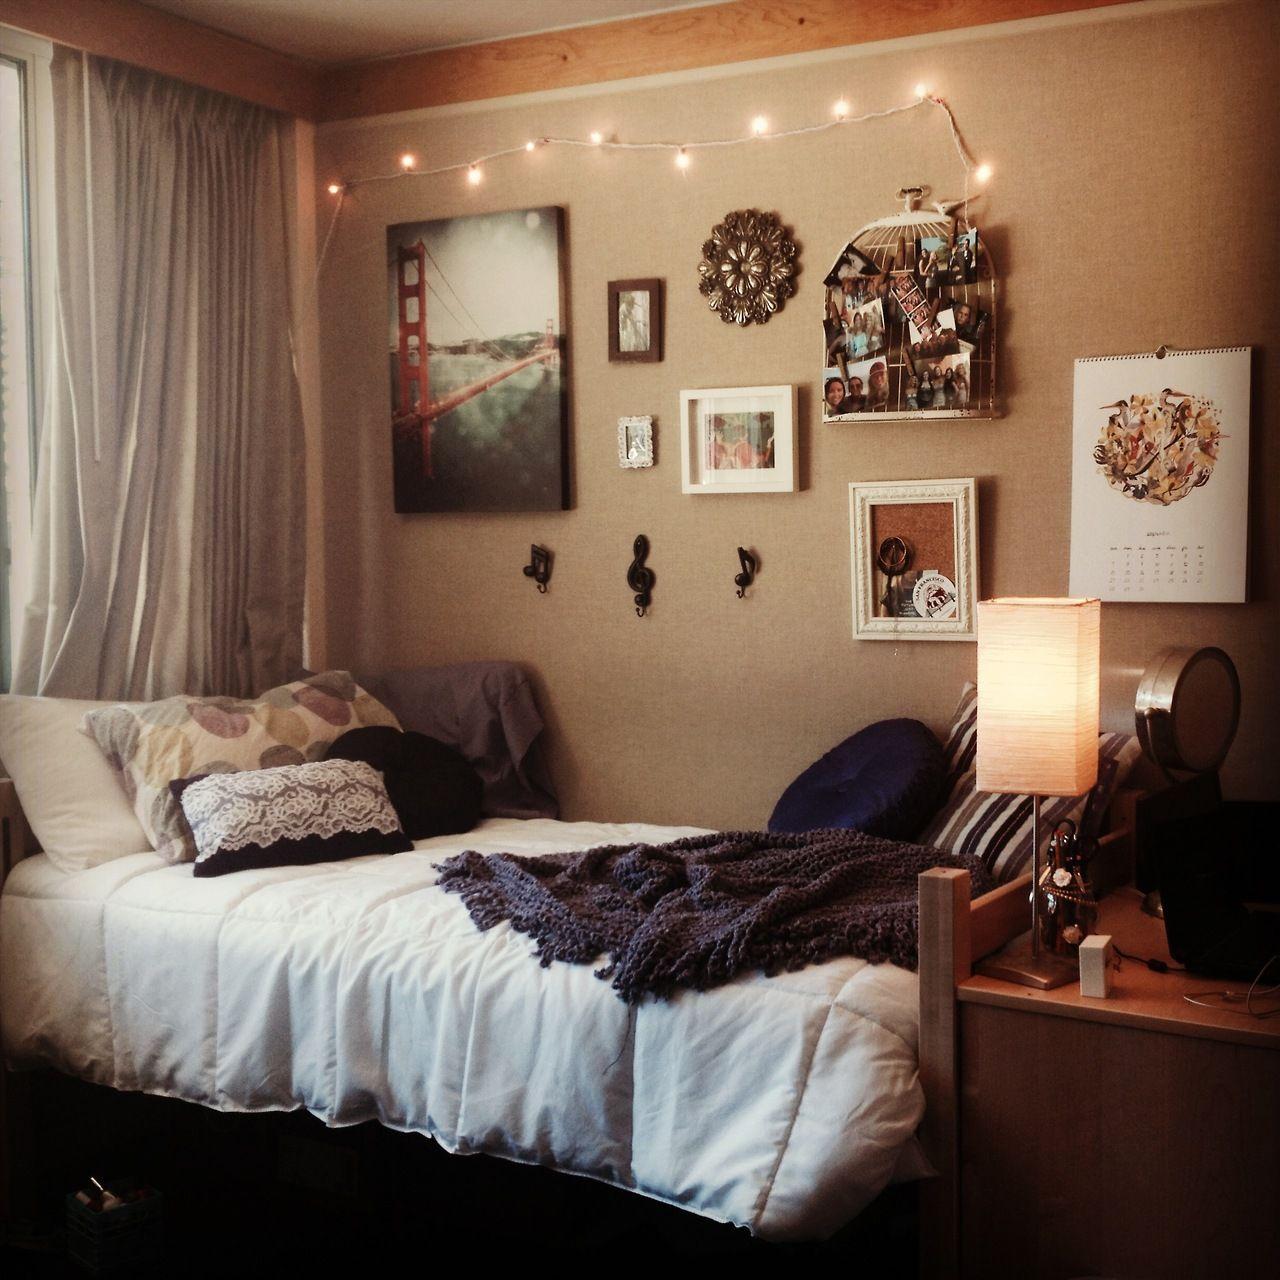 Great Dorm Room From University Of California, Santa Barbara Love The Wall  Decorations